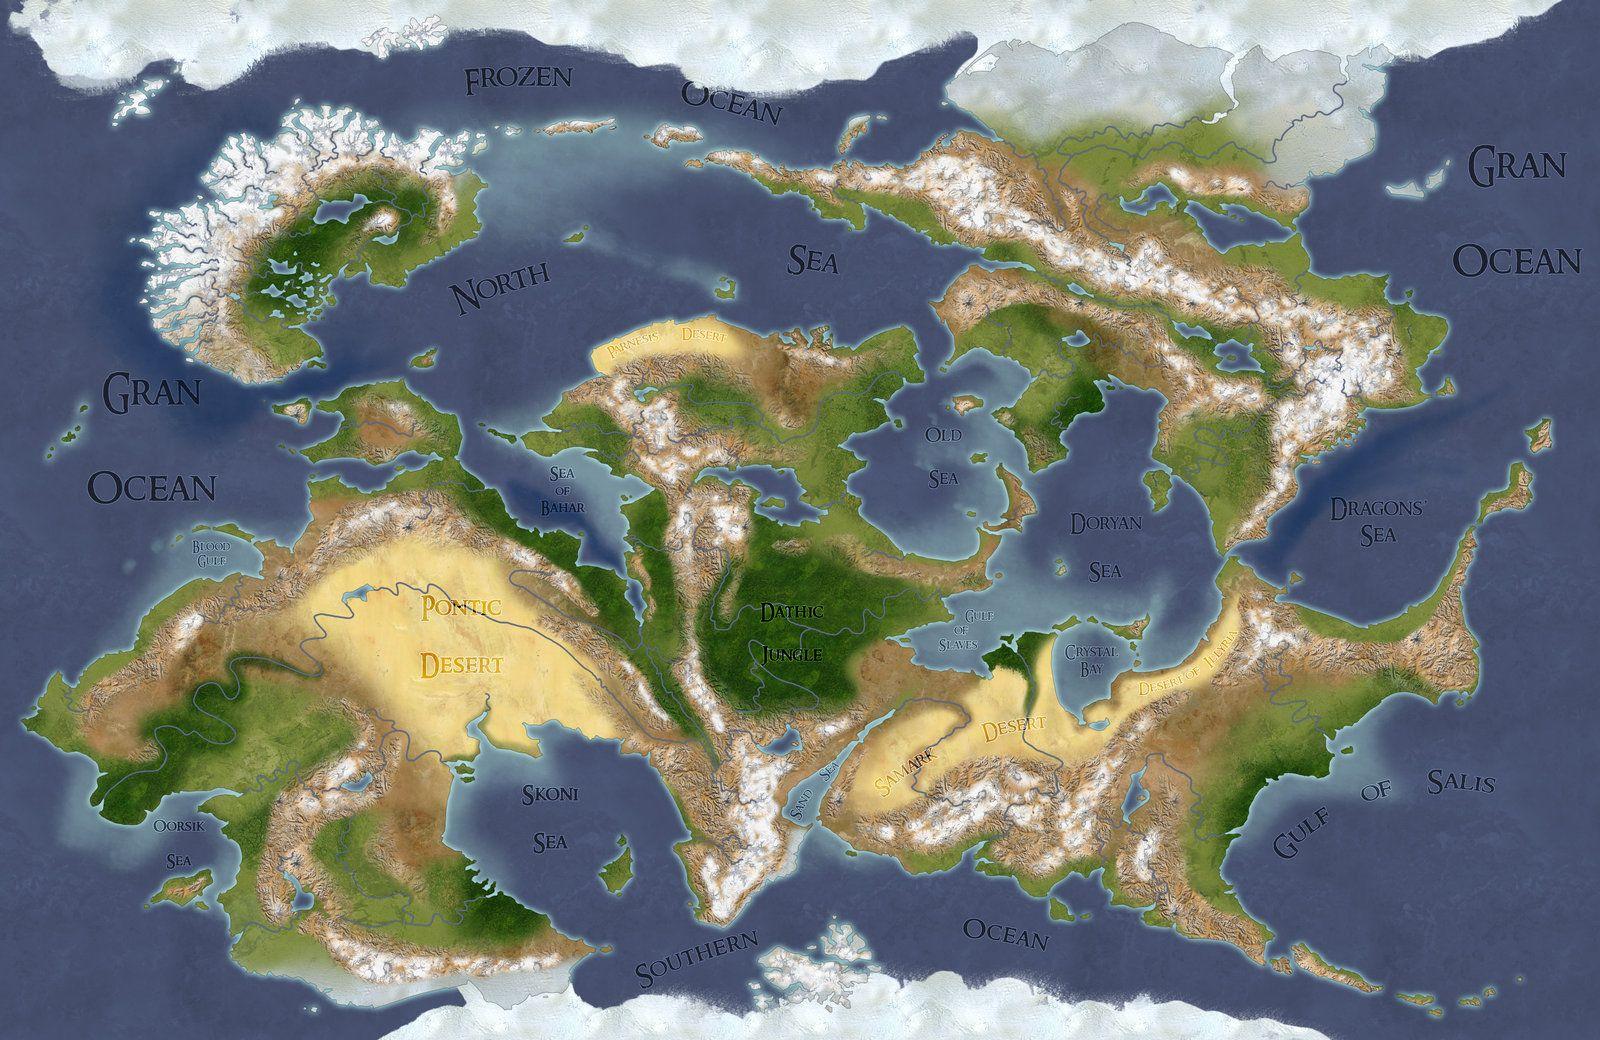 Original map by gamera1985iantart on deviantart dd original map by gamera1985iantart on deviantart gumiabroncs Images